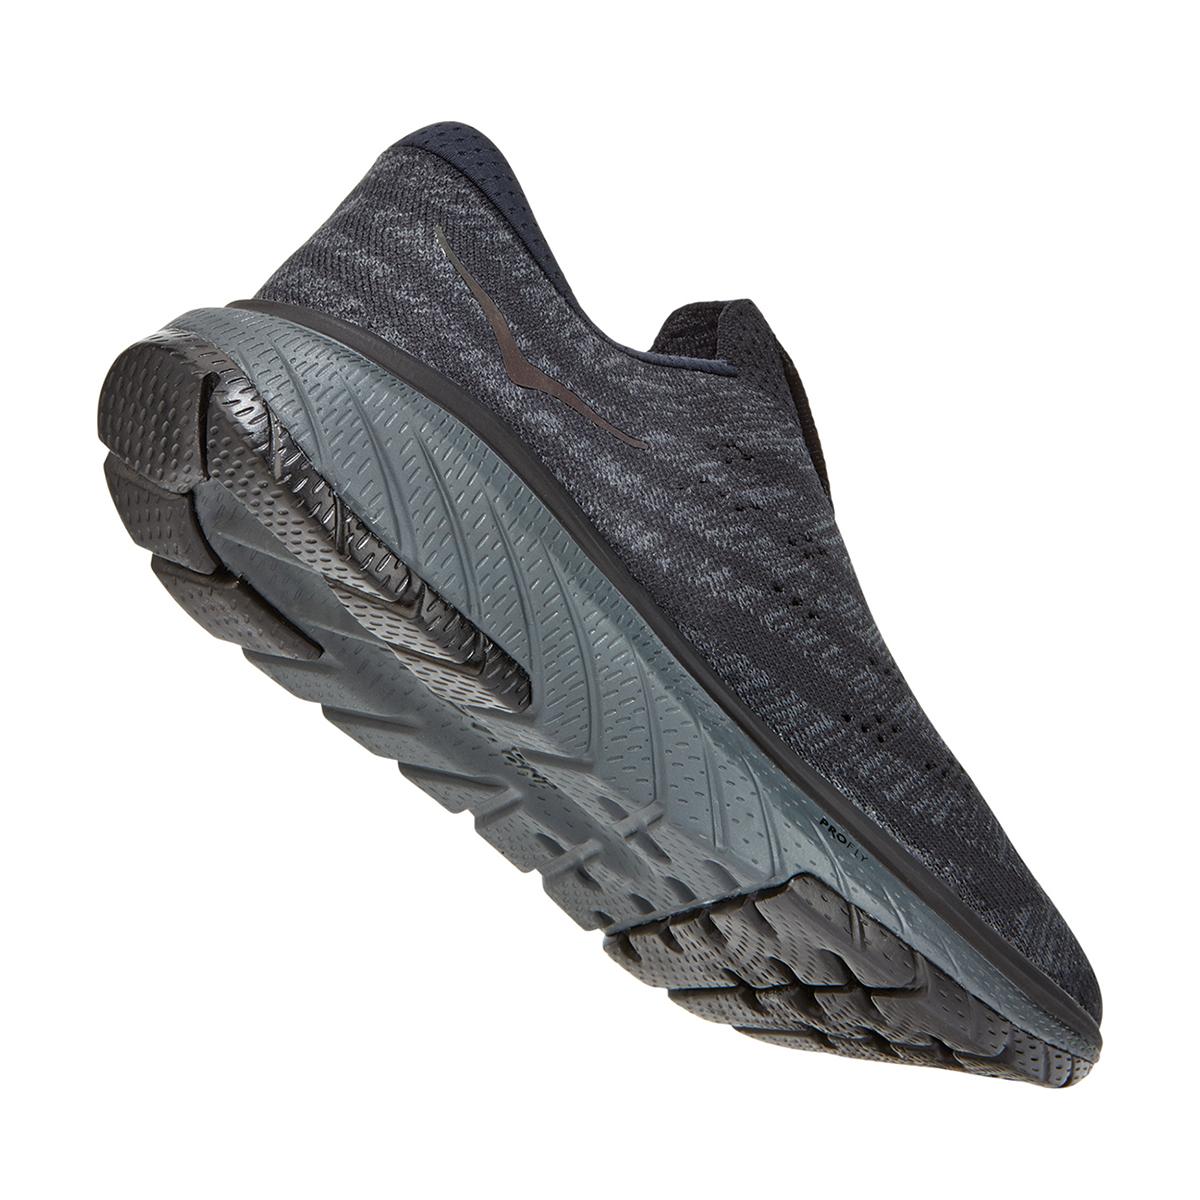 Women's Hoka One One Cavu 3 Slip Running Shoe - Color: Black/Dark Shadow - Size: 5 - Width: Regular, Black/Dark Shadow, large, image 6